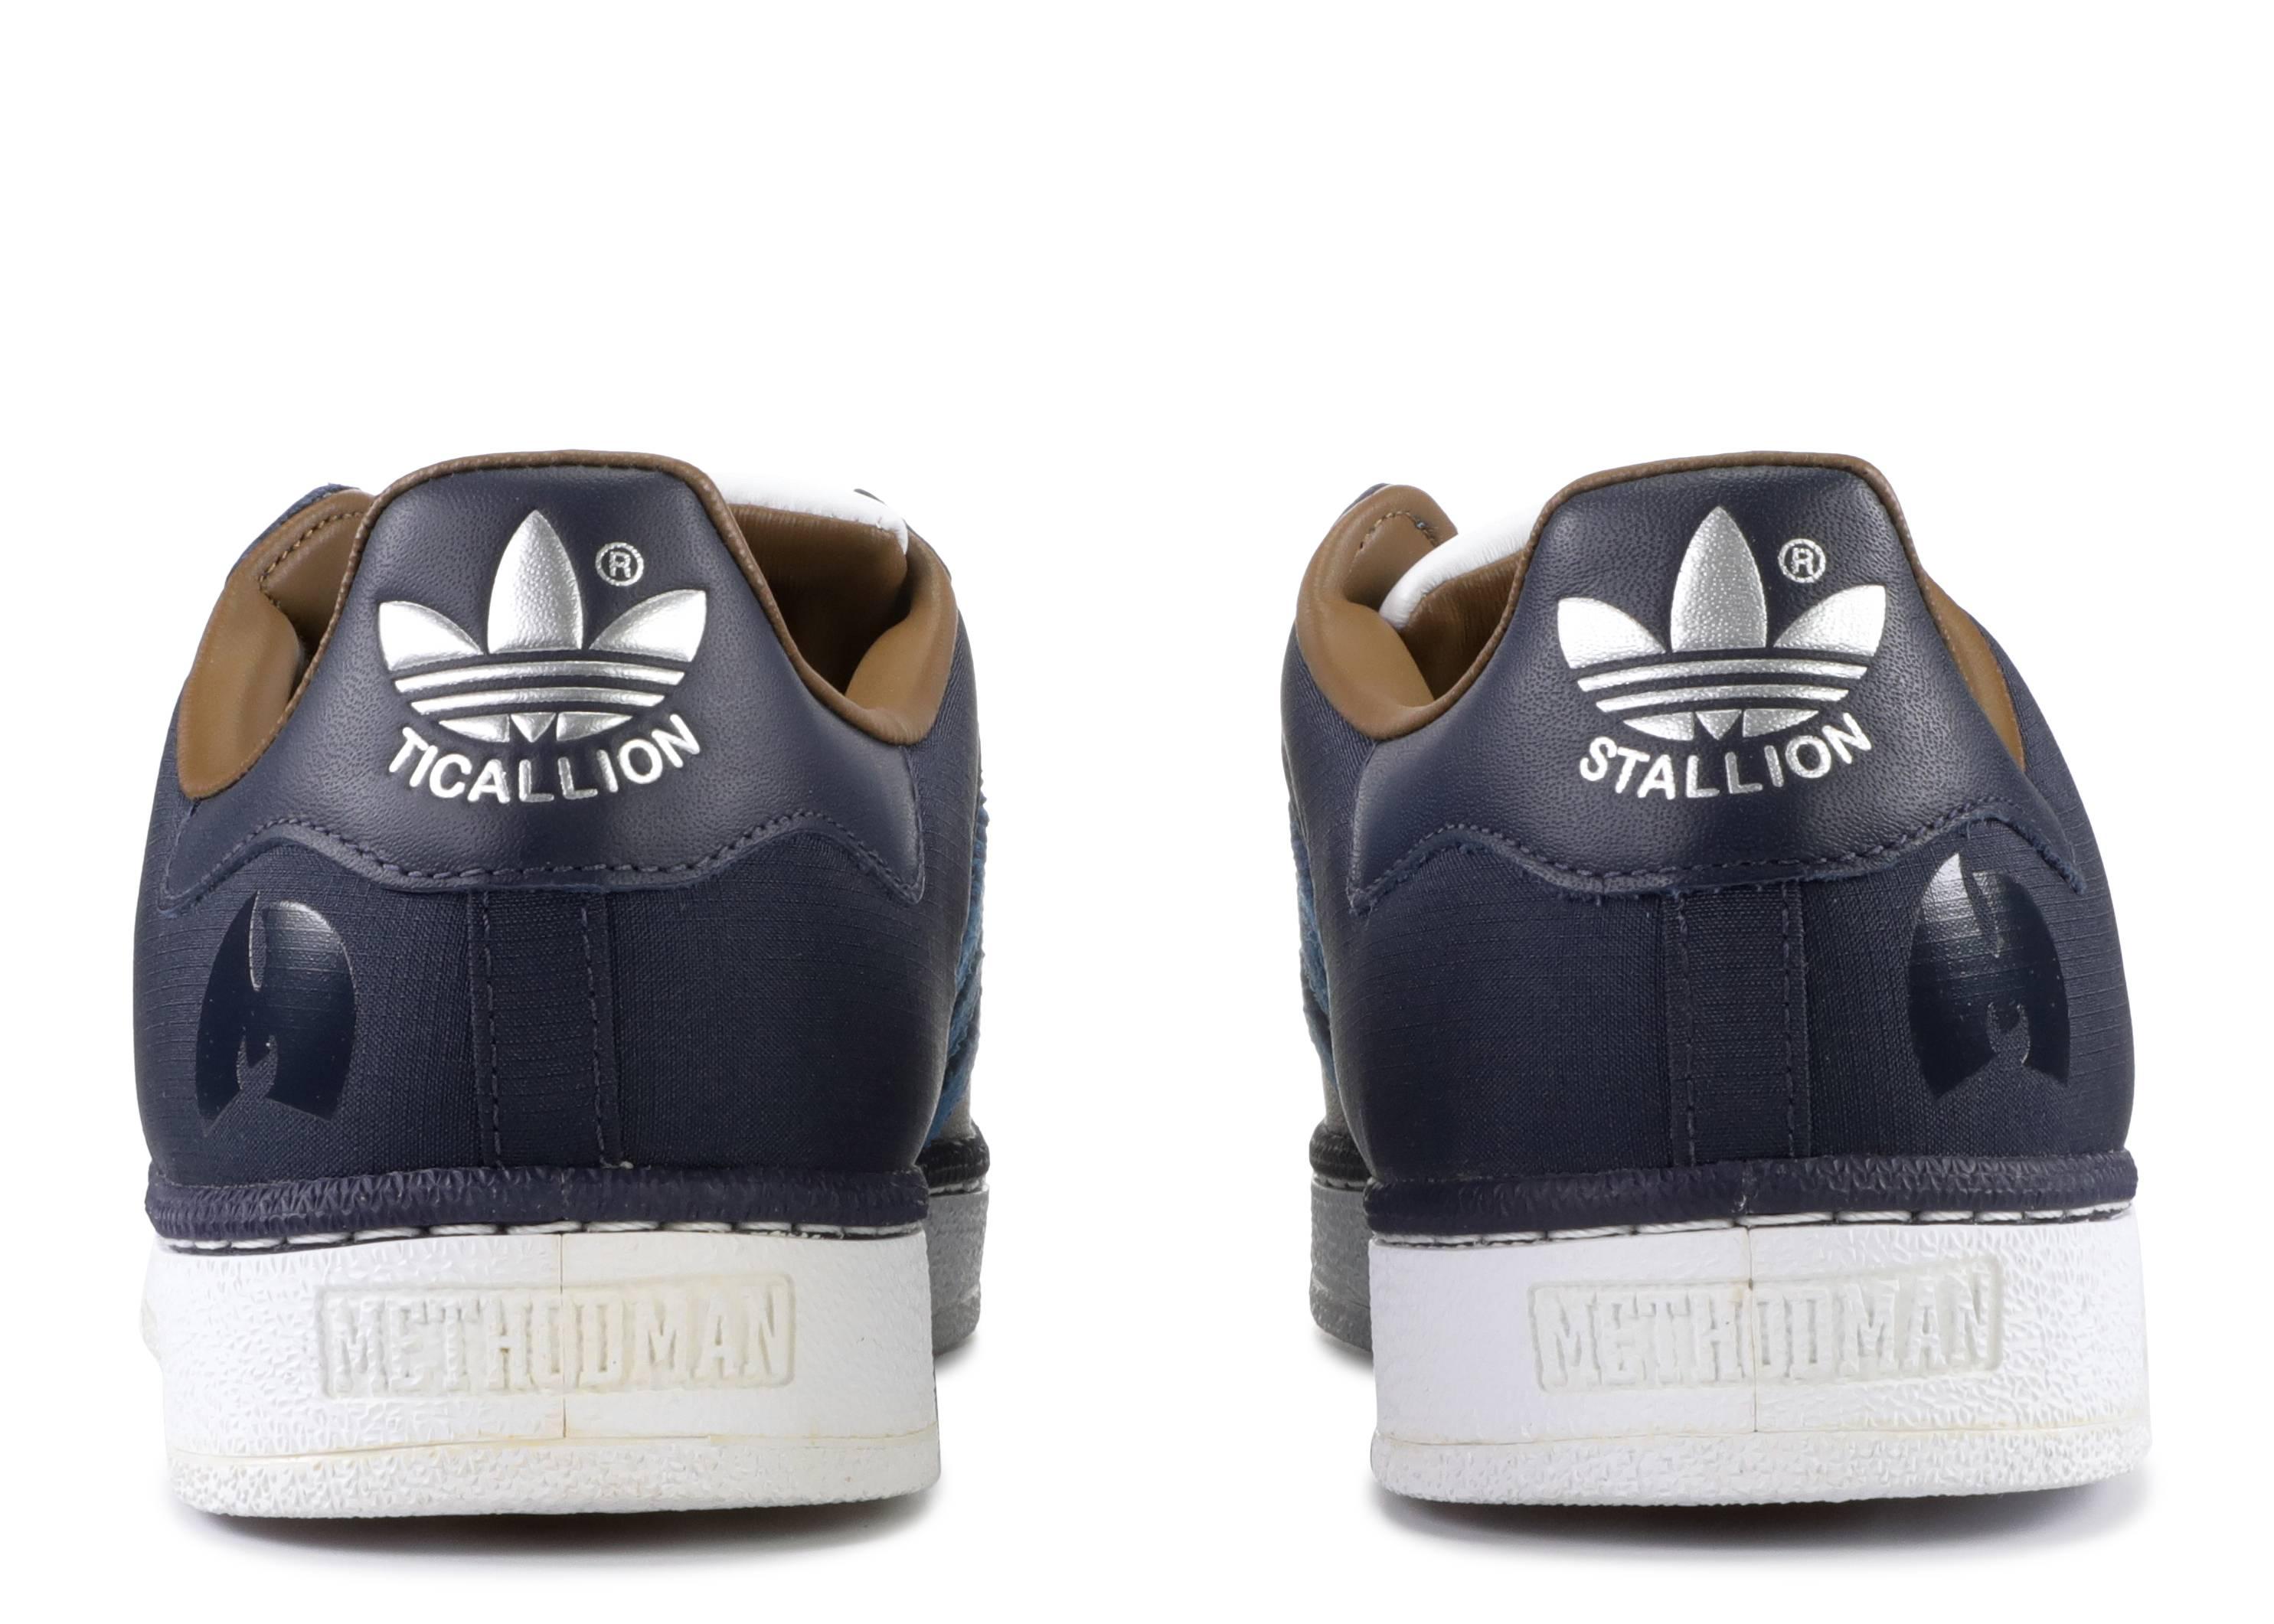 lowest price d257b 2c0e7 adidas Superstar 2 Def Jam Methodman